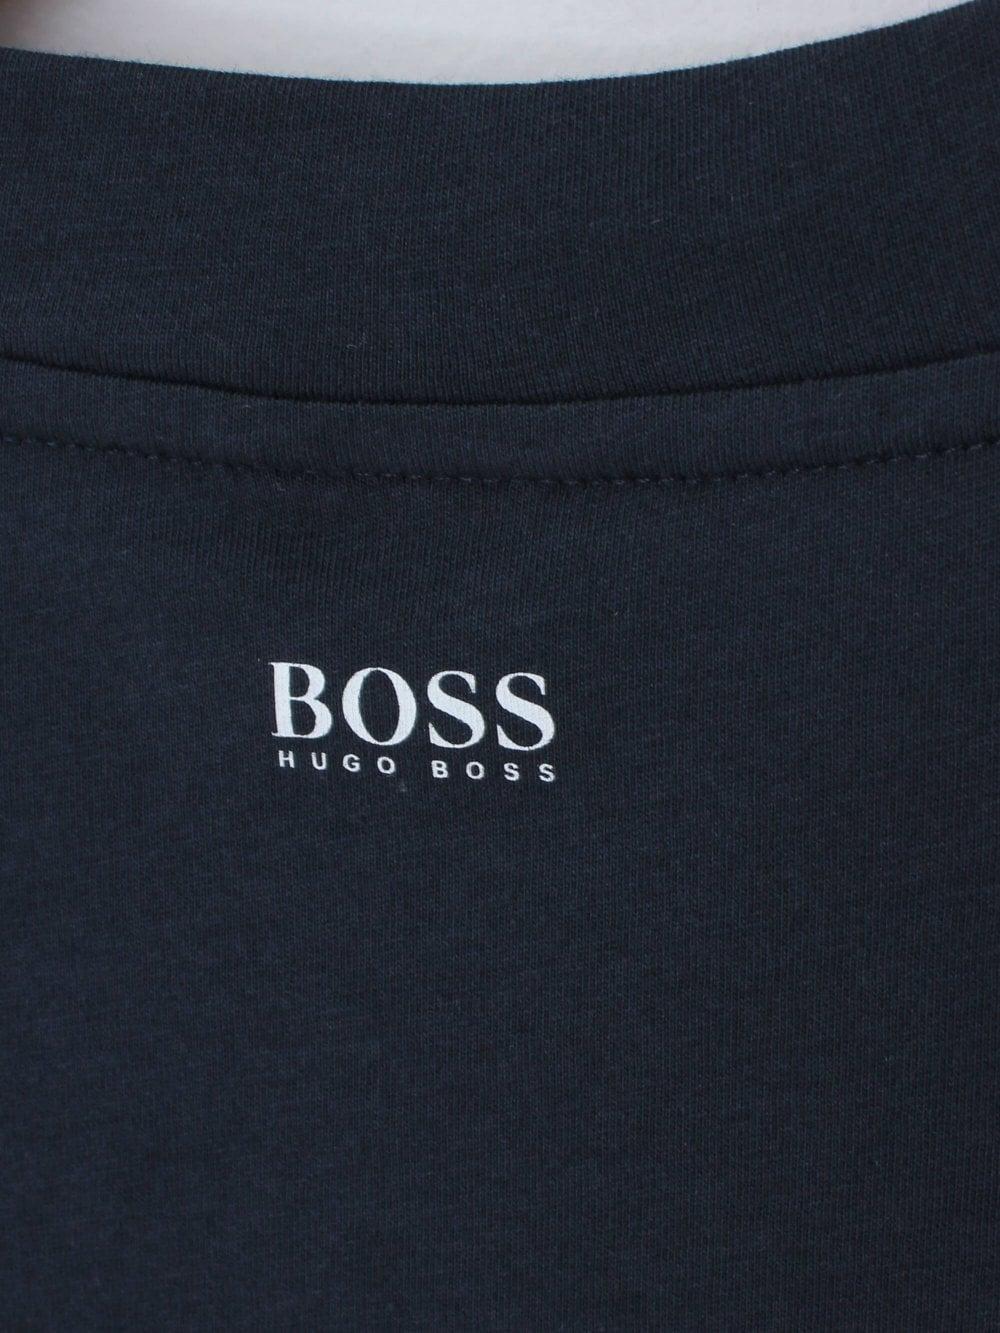 0dbce7c14 Hugo Boss Casual Teecher 2 T.shirt in Dark Blue | Northern Threads